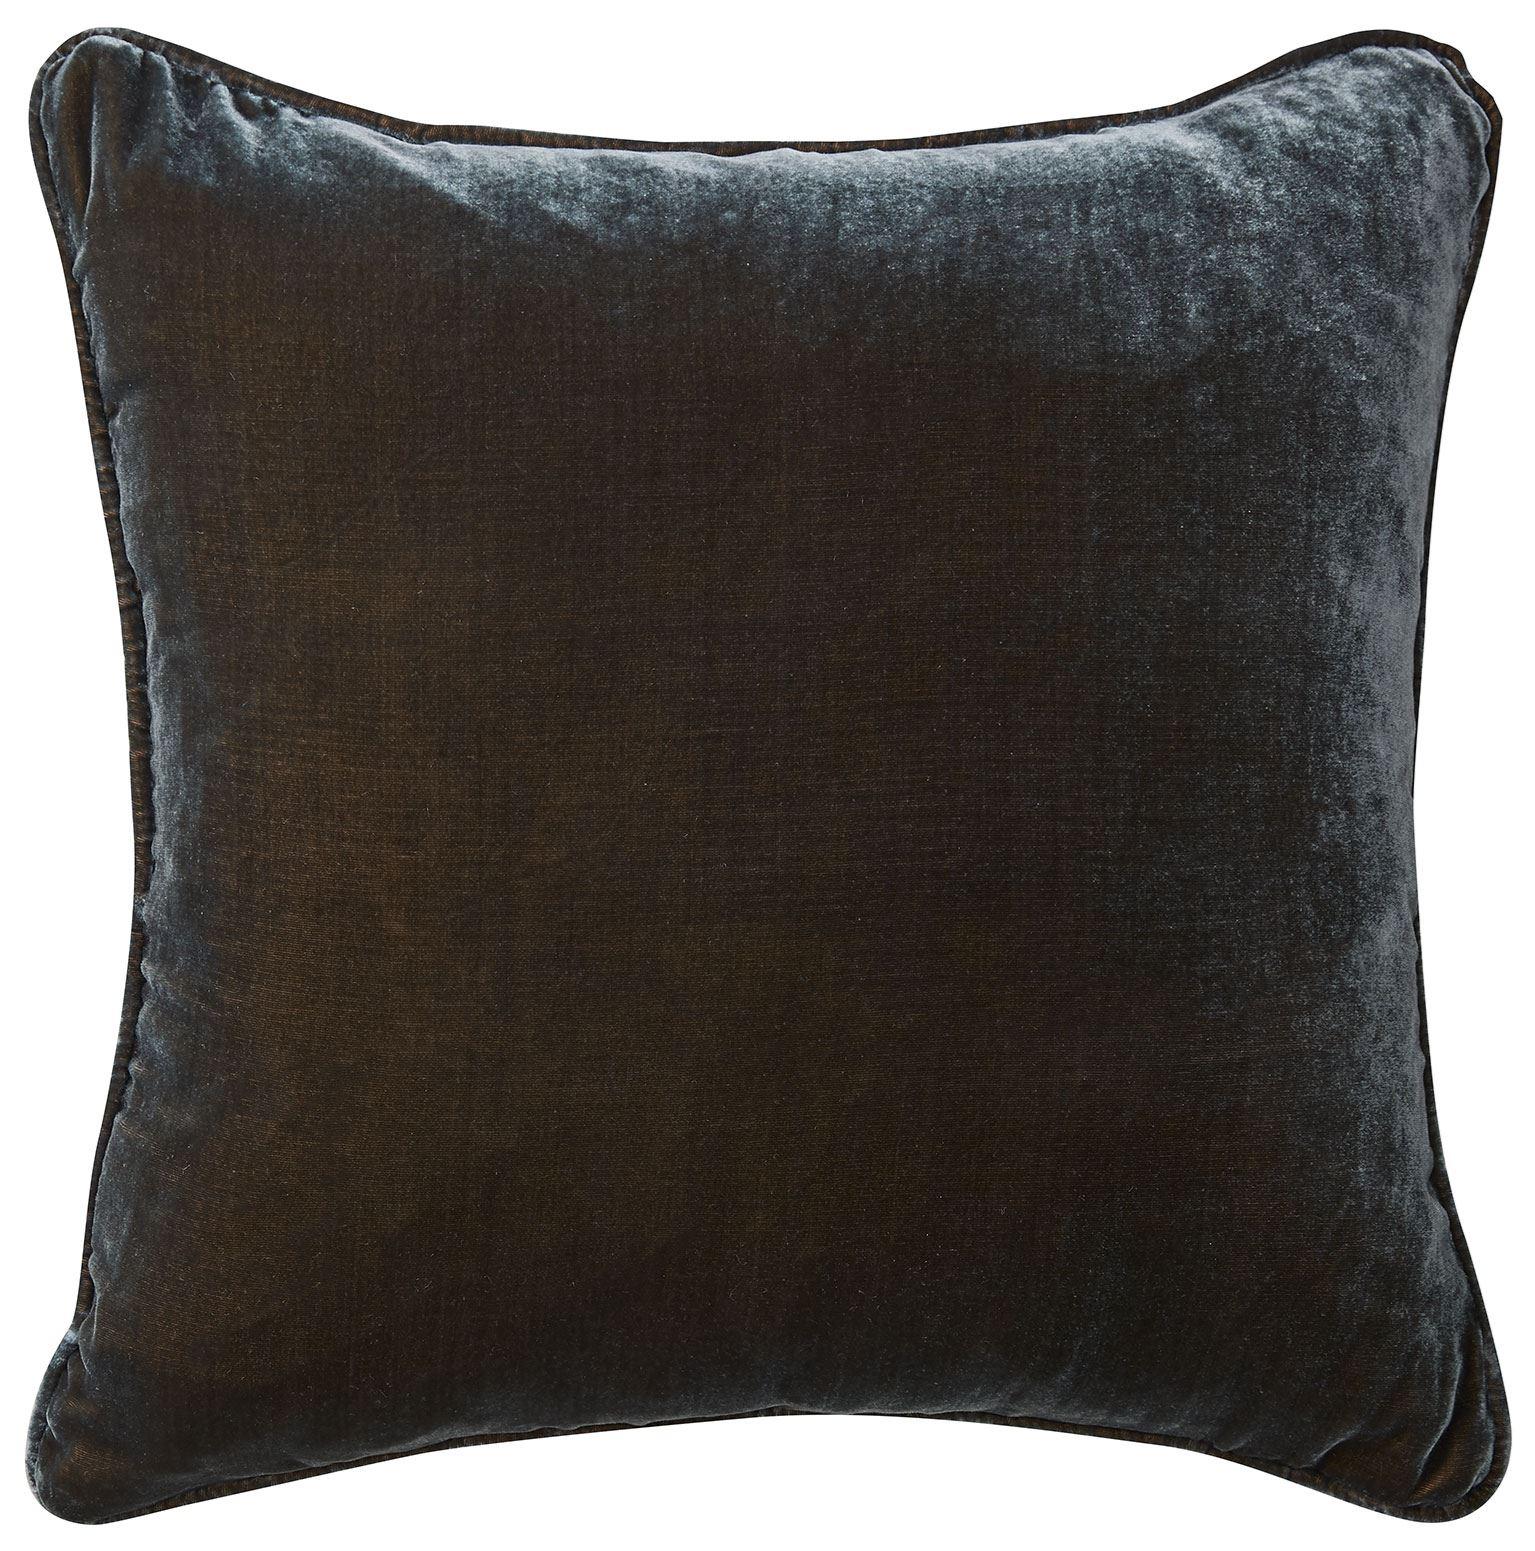 Picture of Silk Velvet Cushion - Petrol